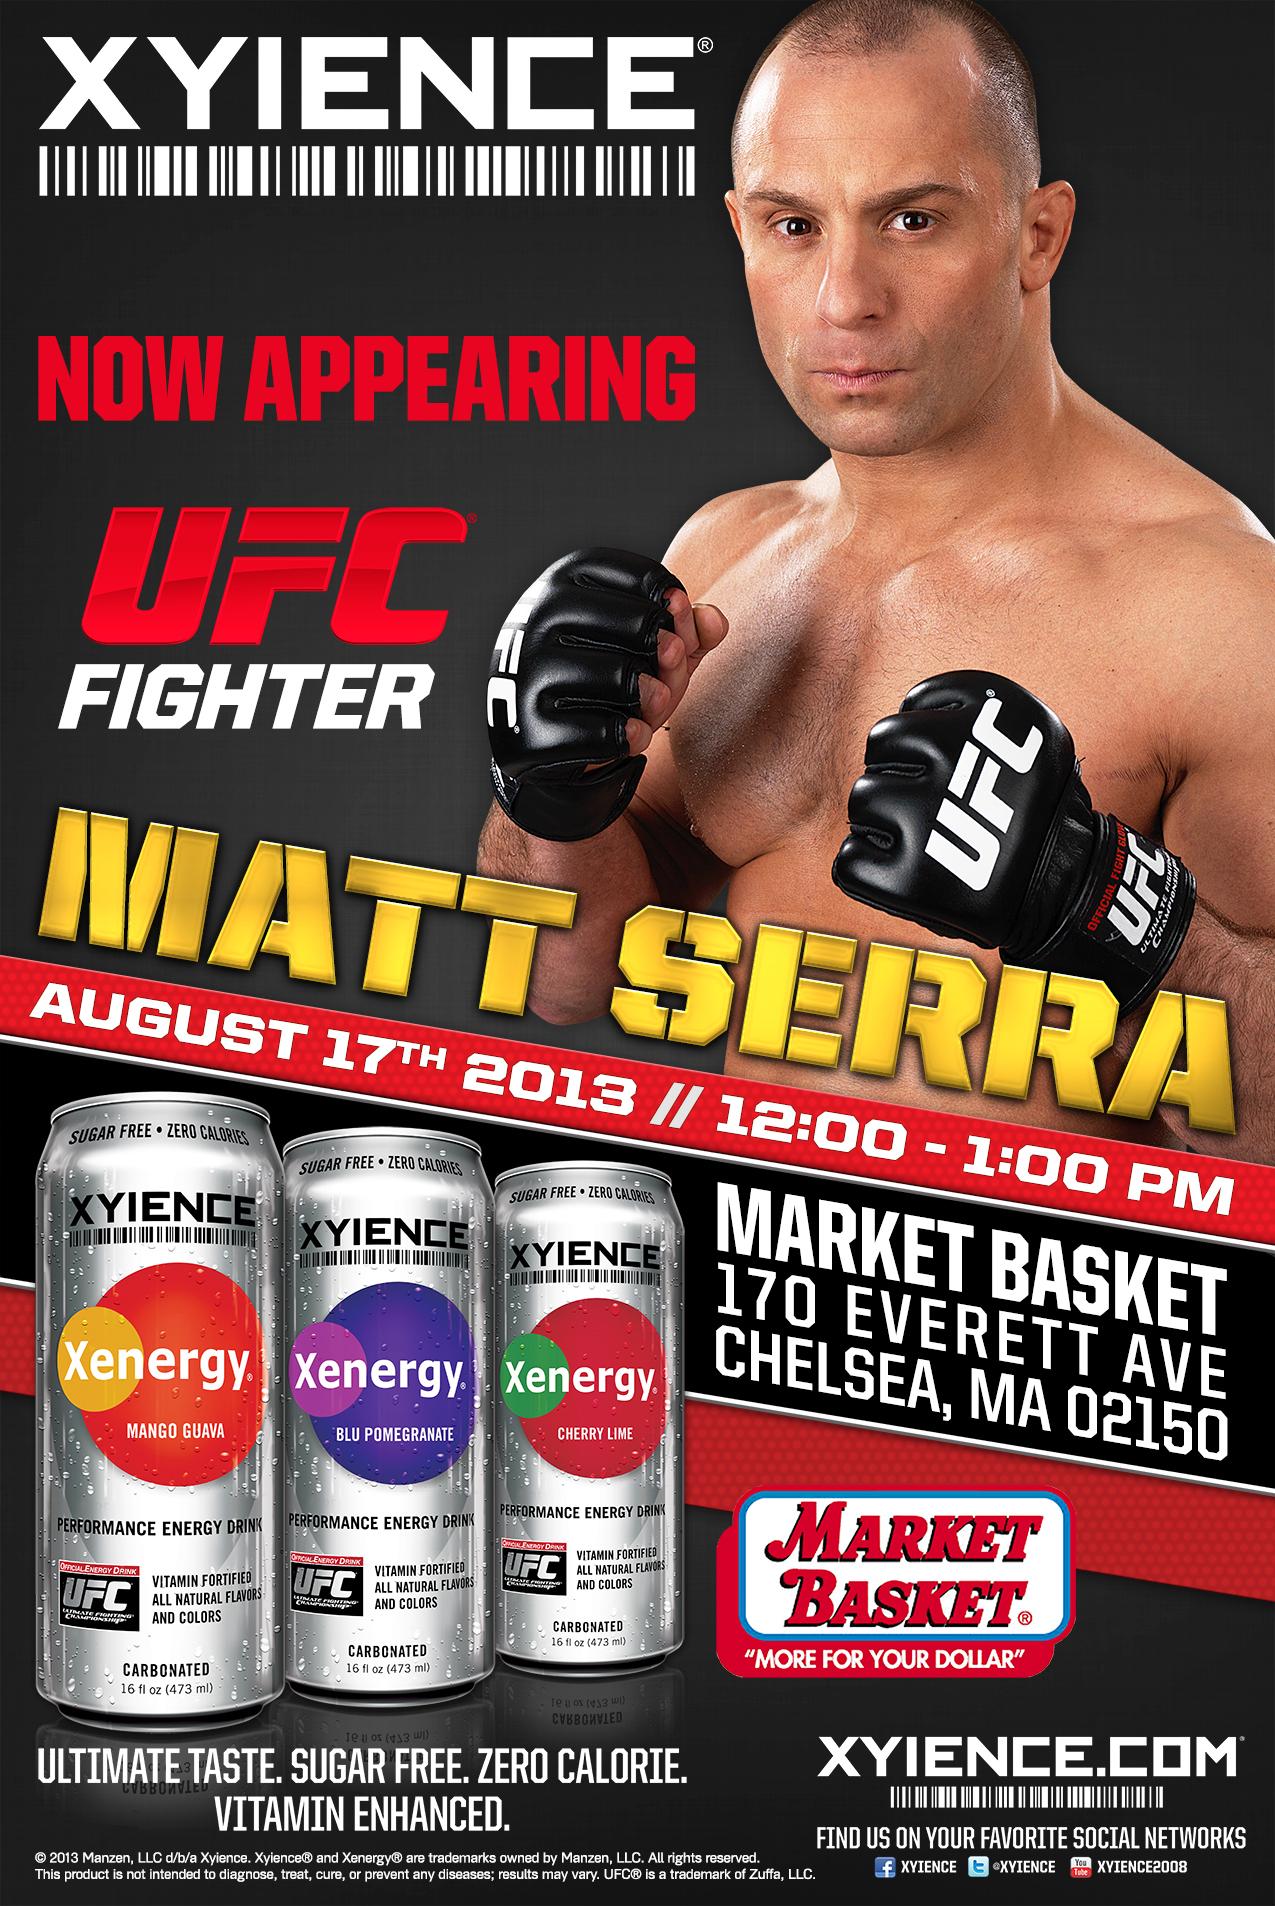 Matt Serra Appearance#5F425